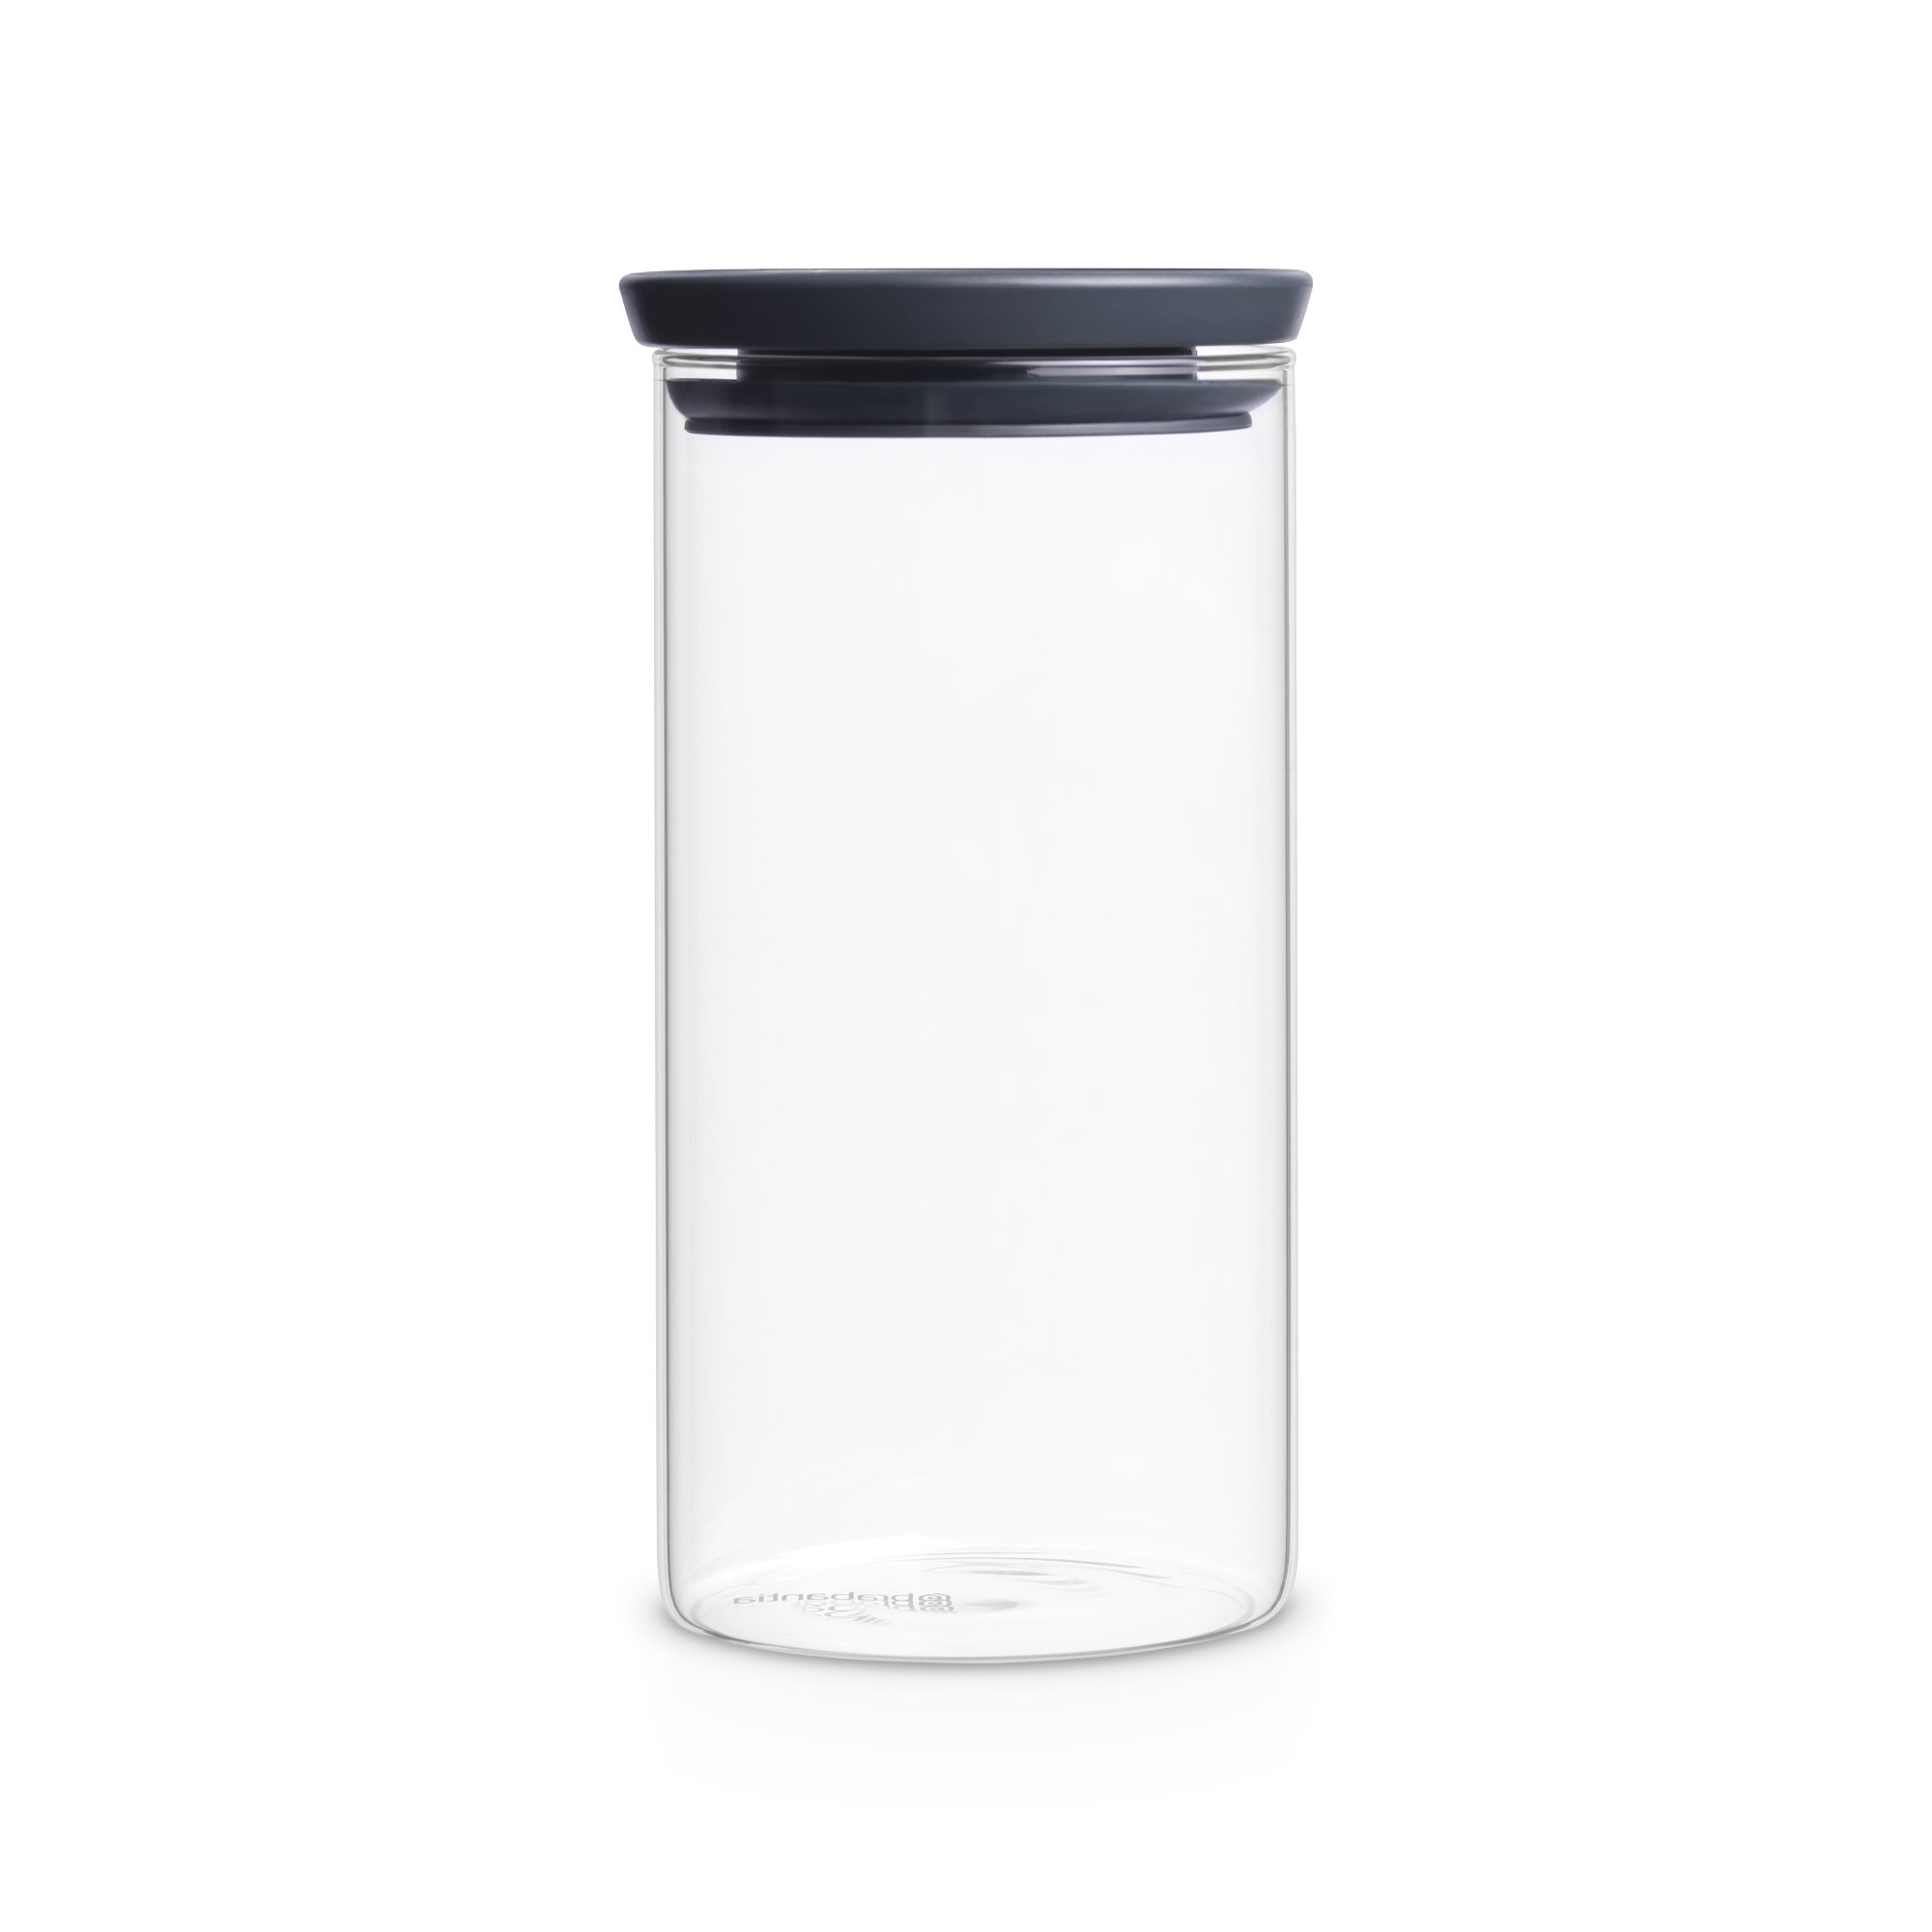 brabantia vorratsglas 1 1 liter stapelbar mit grauem deckel ebay. Black Bedroom Furniture Sets. Home Design Ideas